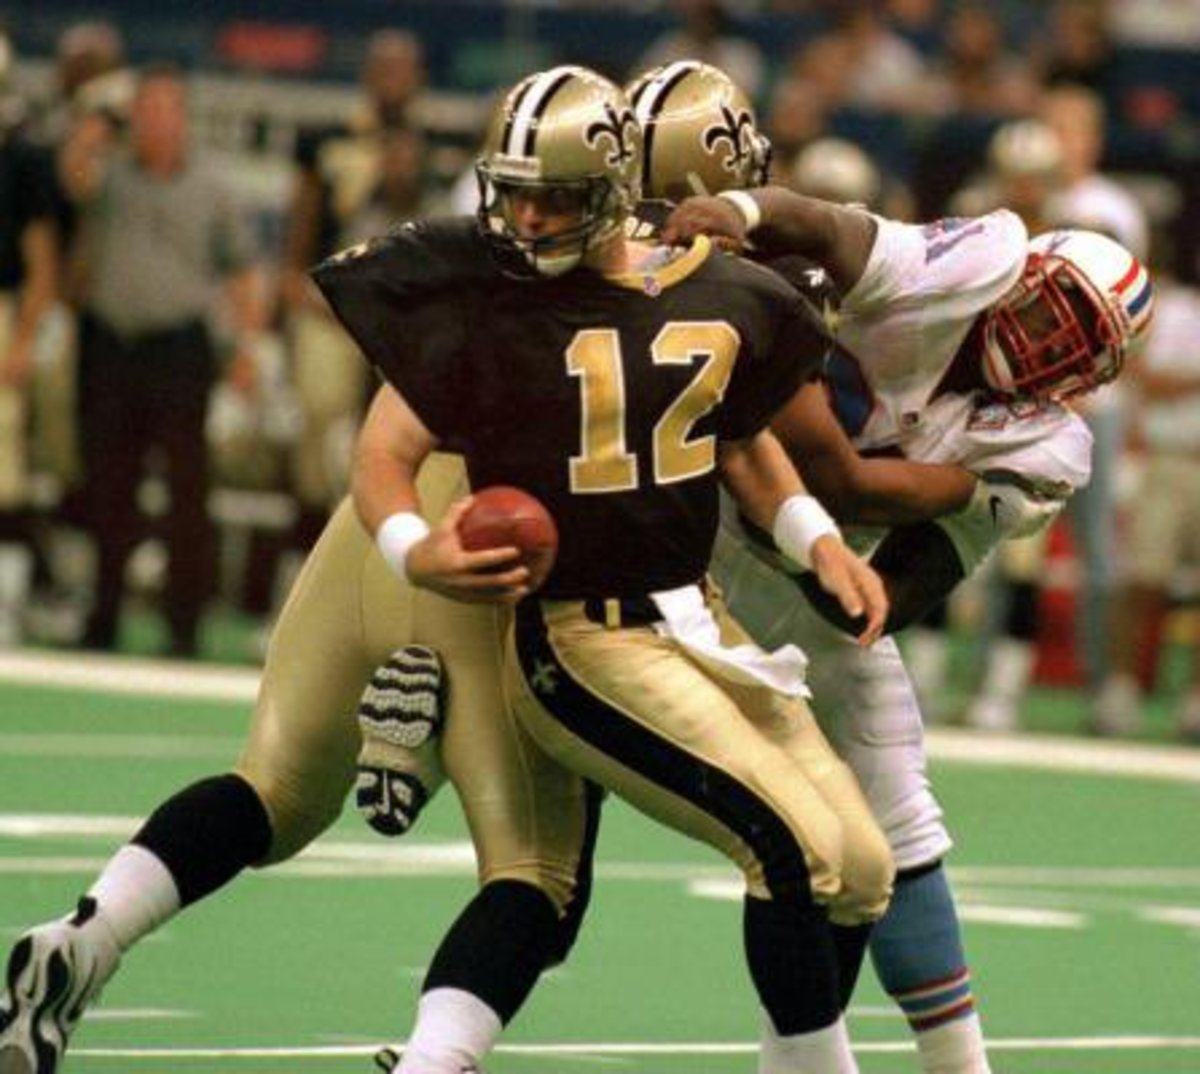 Former New Orleans Saints quarterback Billy Joe Hobert (12). Via Twitter.com